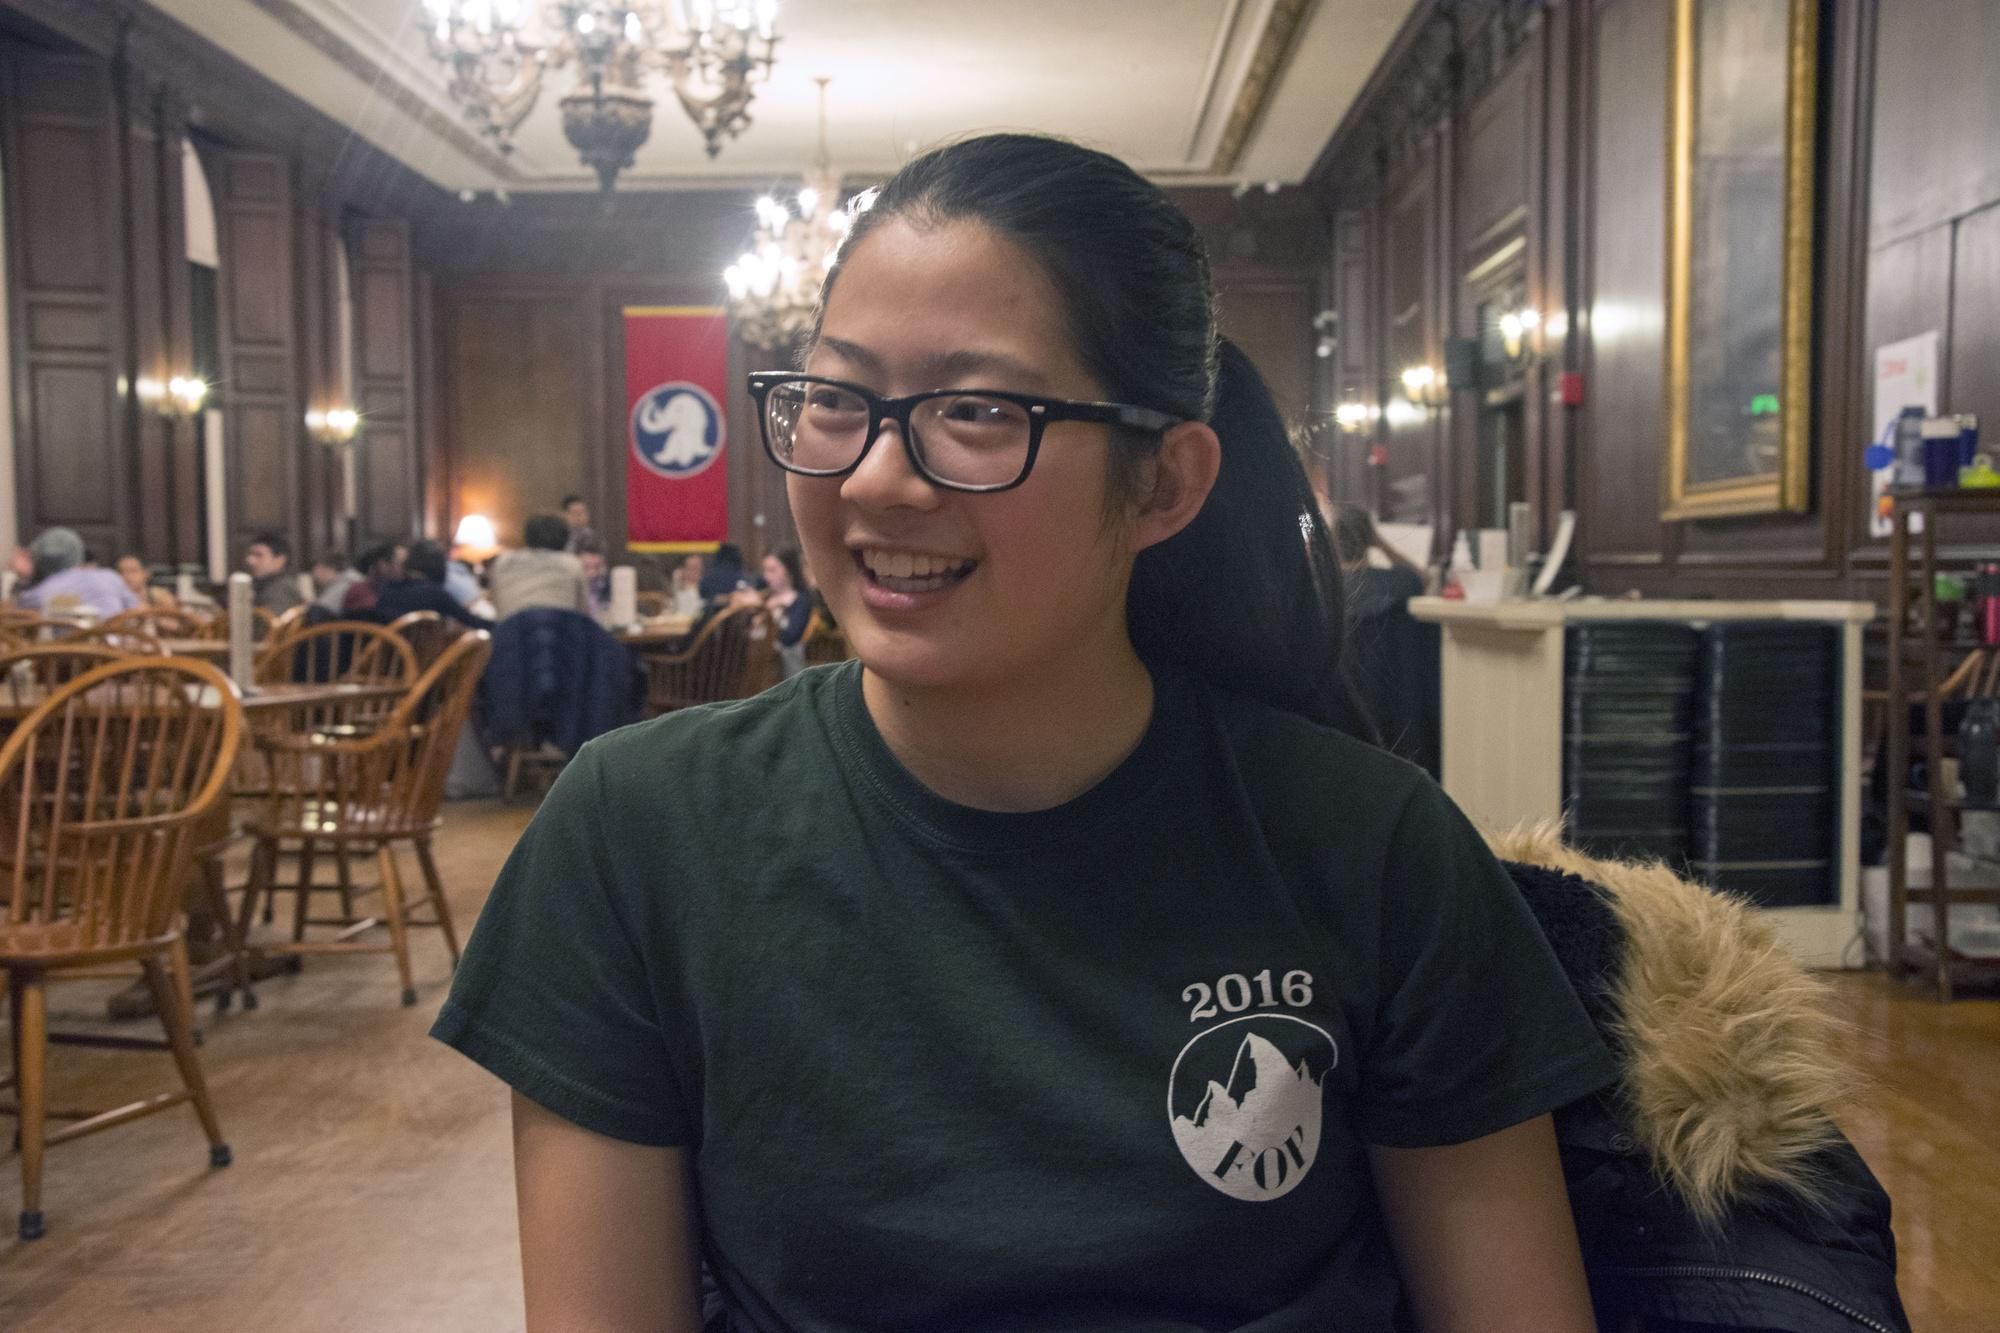 Harvard freshman Rebecca Chen '20, the starter of Harvard Memes for Elitist 1% Tweens. The Facebook meme page is modeled after two similar university-based groups––UCLA Memes for Sick AF Tweens and UC Berkeley Memes for Edgy Teens.